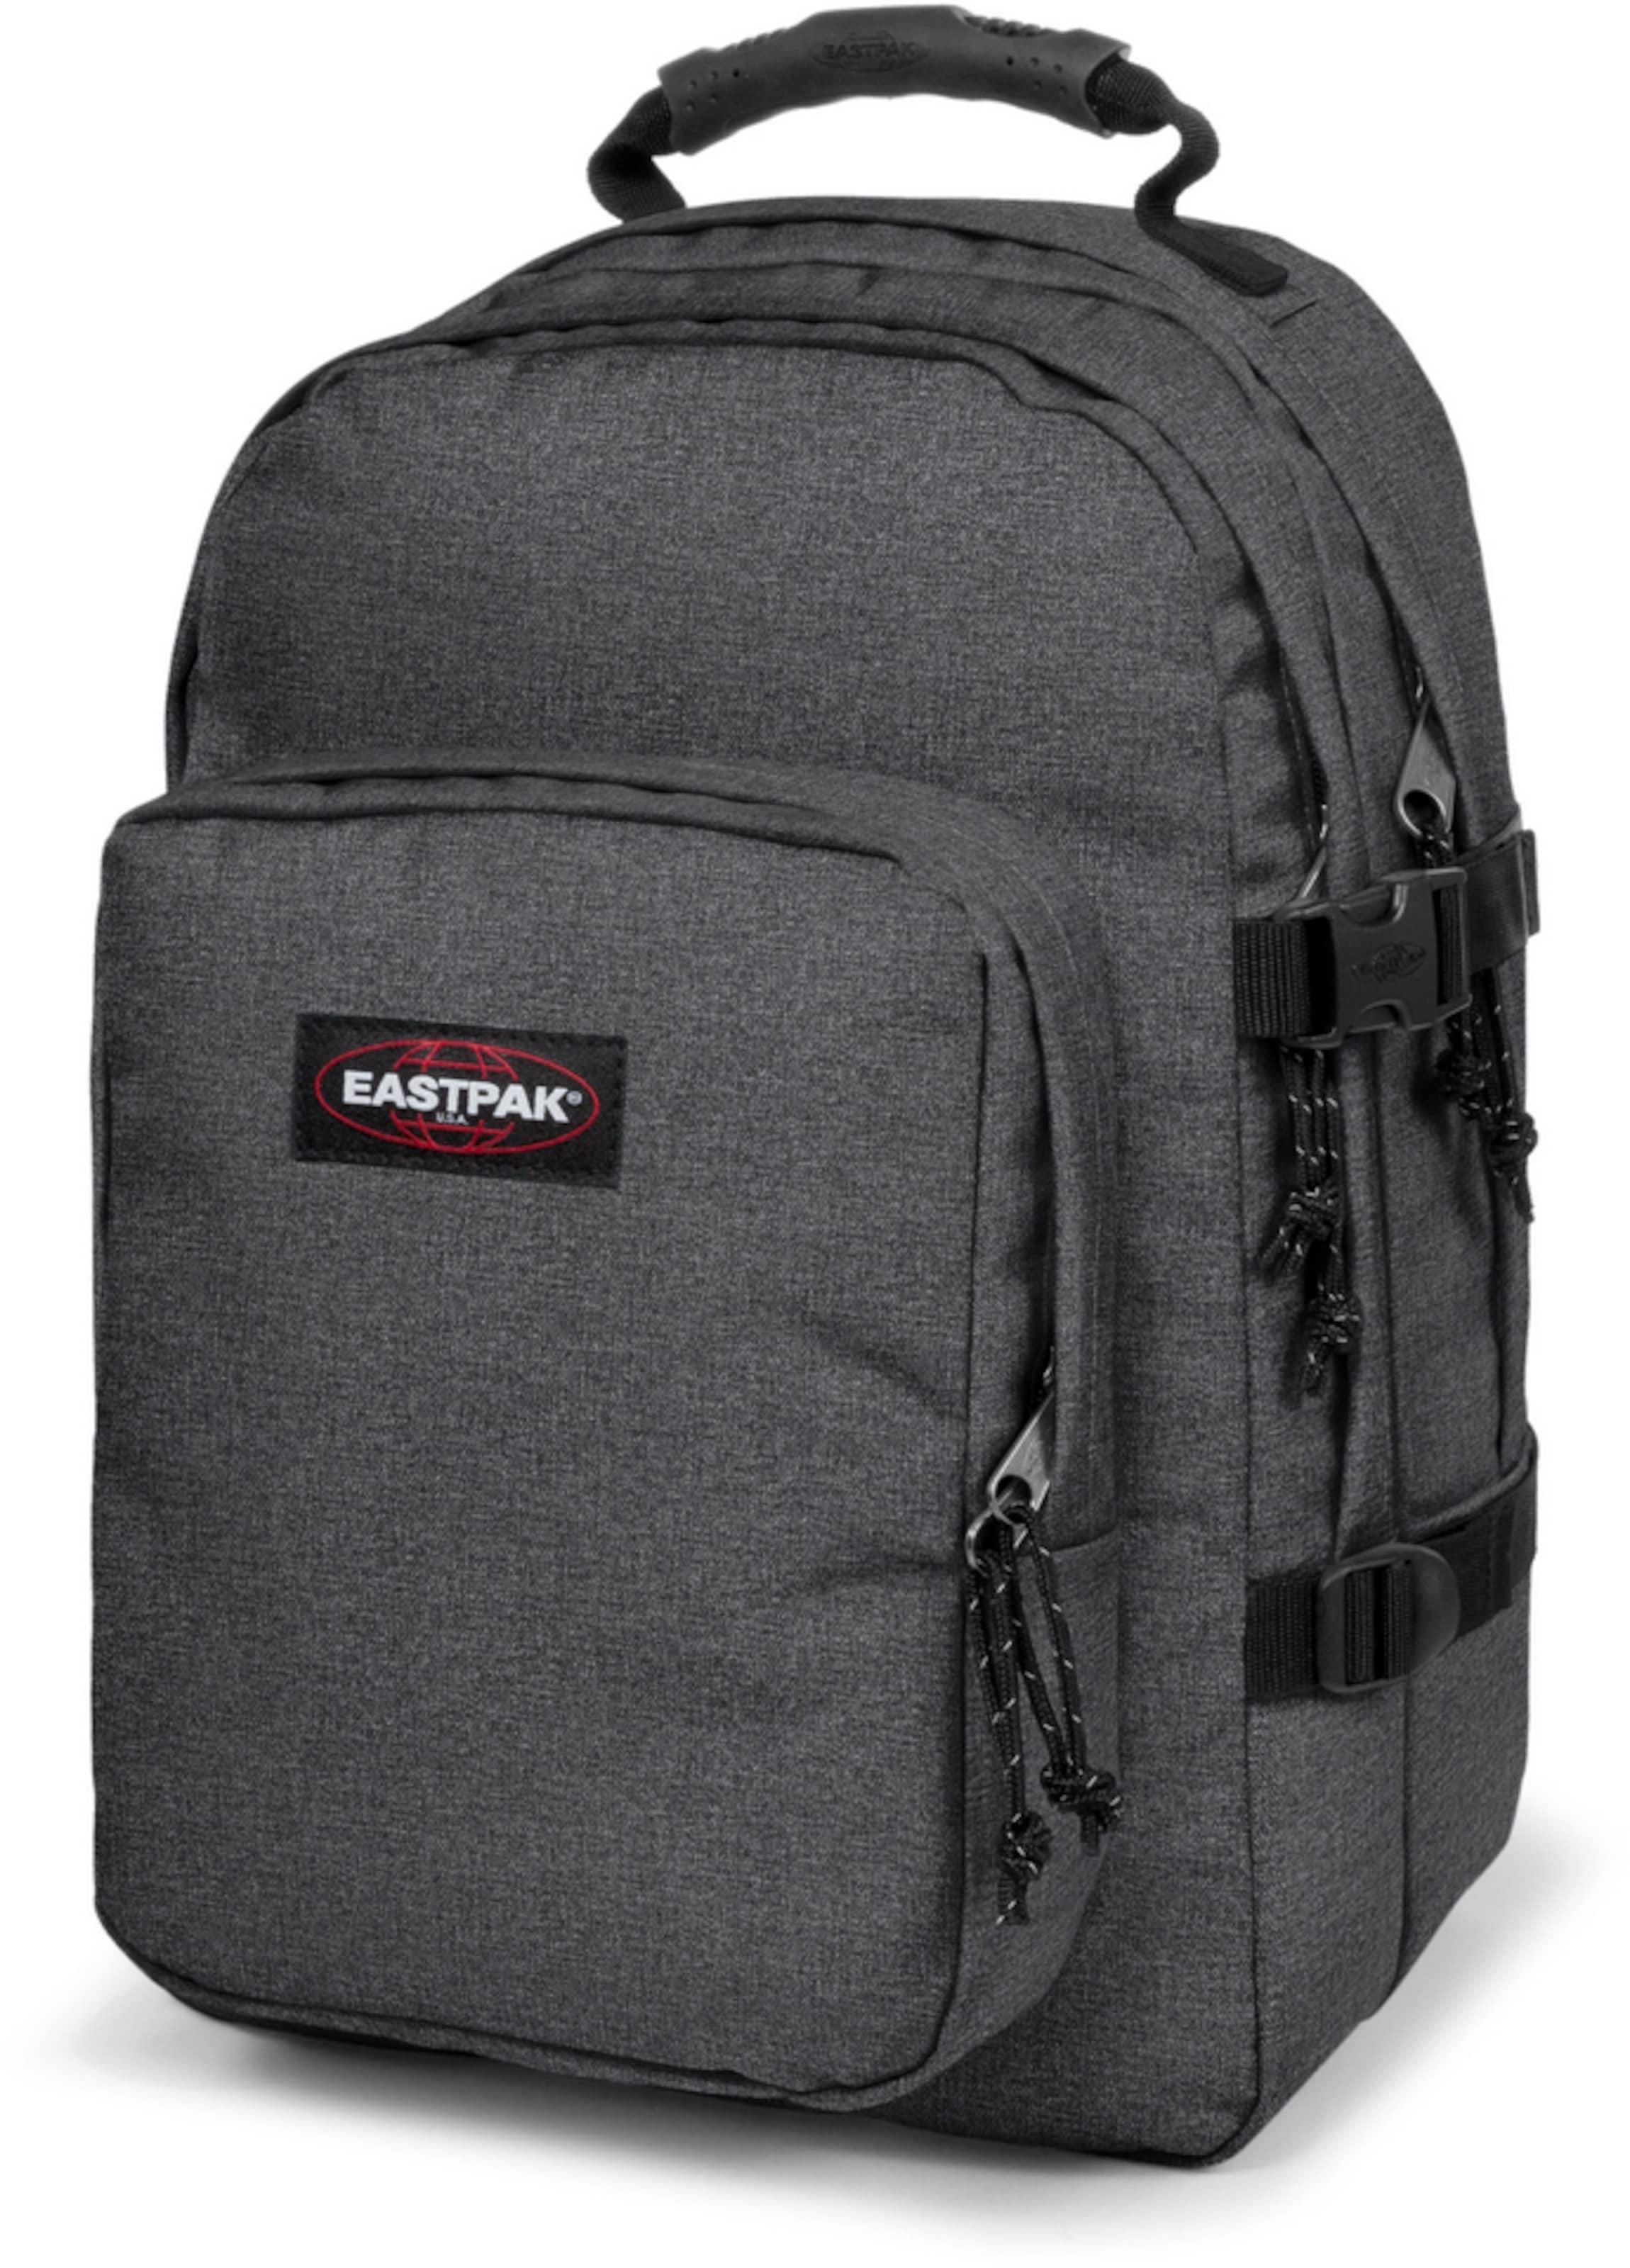 EASTPAK Provider Rucksack Rucksack EASTPAK Collection cm Authentic 44 Authentic Laptopfach 44 Collection cm Provider zrnvz6